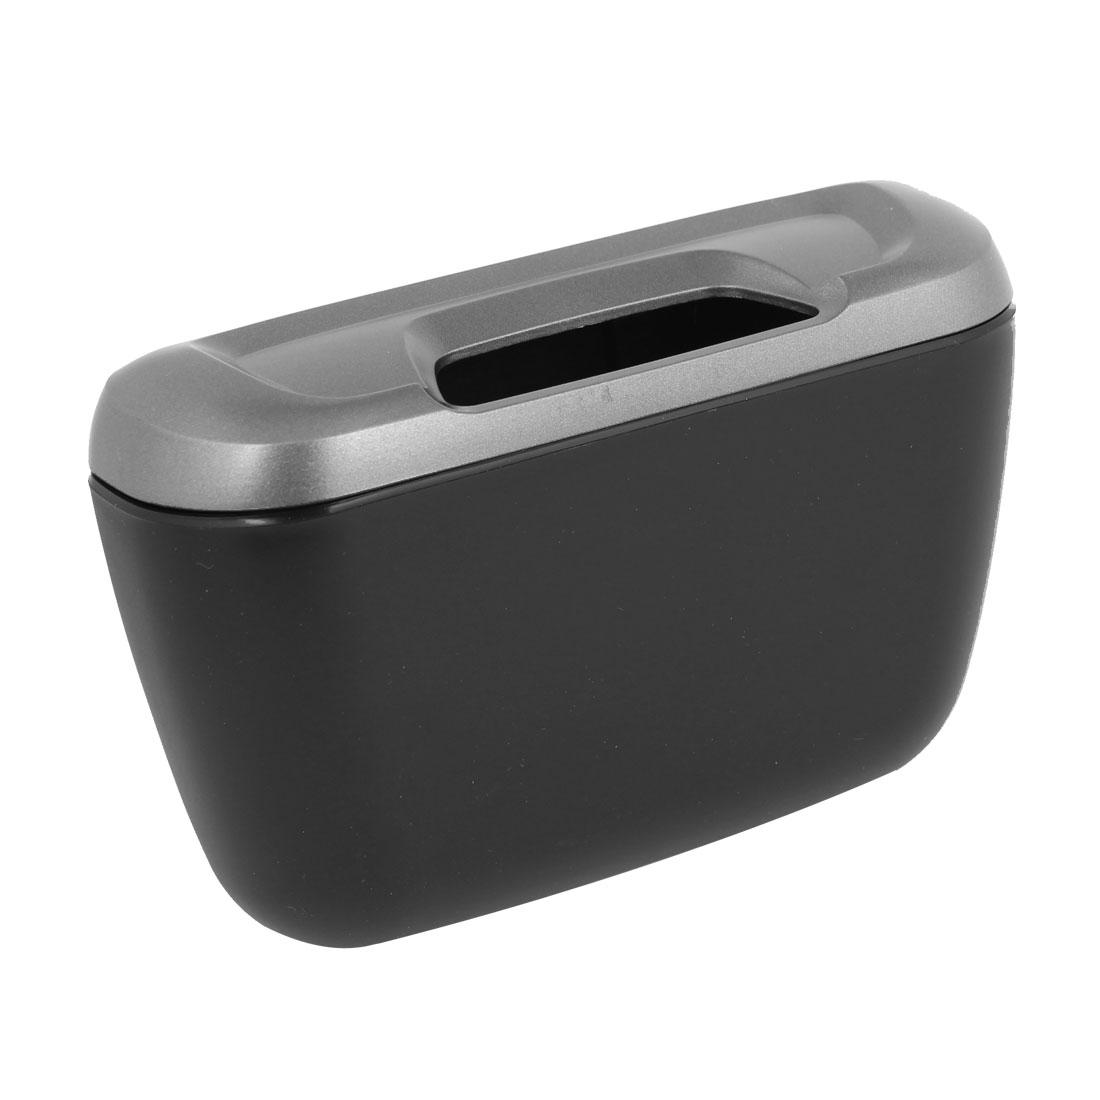 Hook Designed Dark Gray Black Plastic Trash Rubbish Bin Can for Vehicle Car